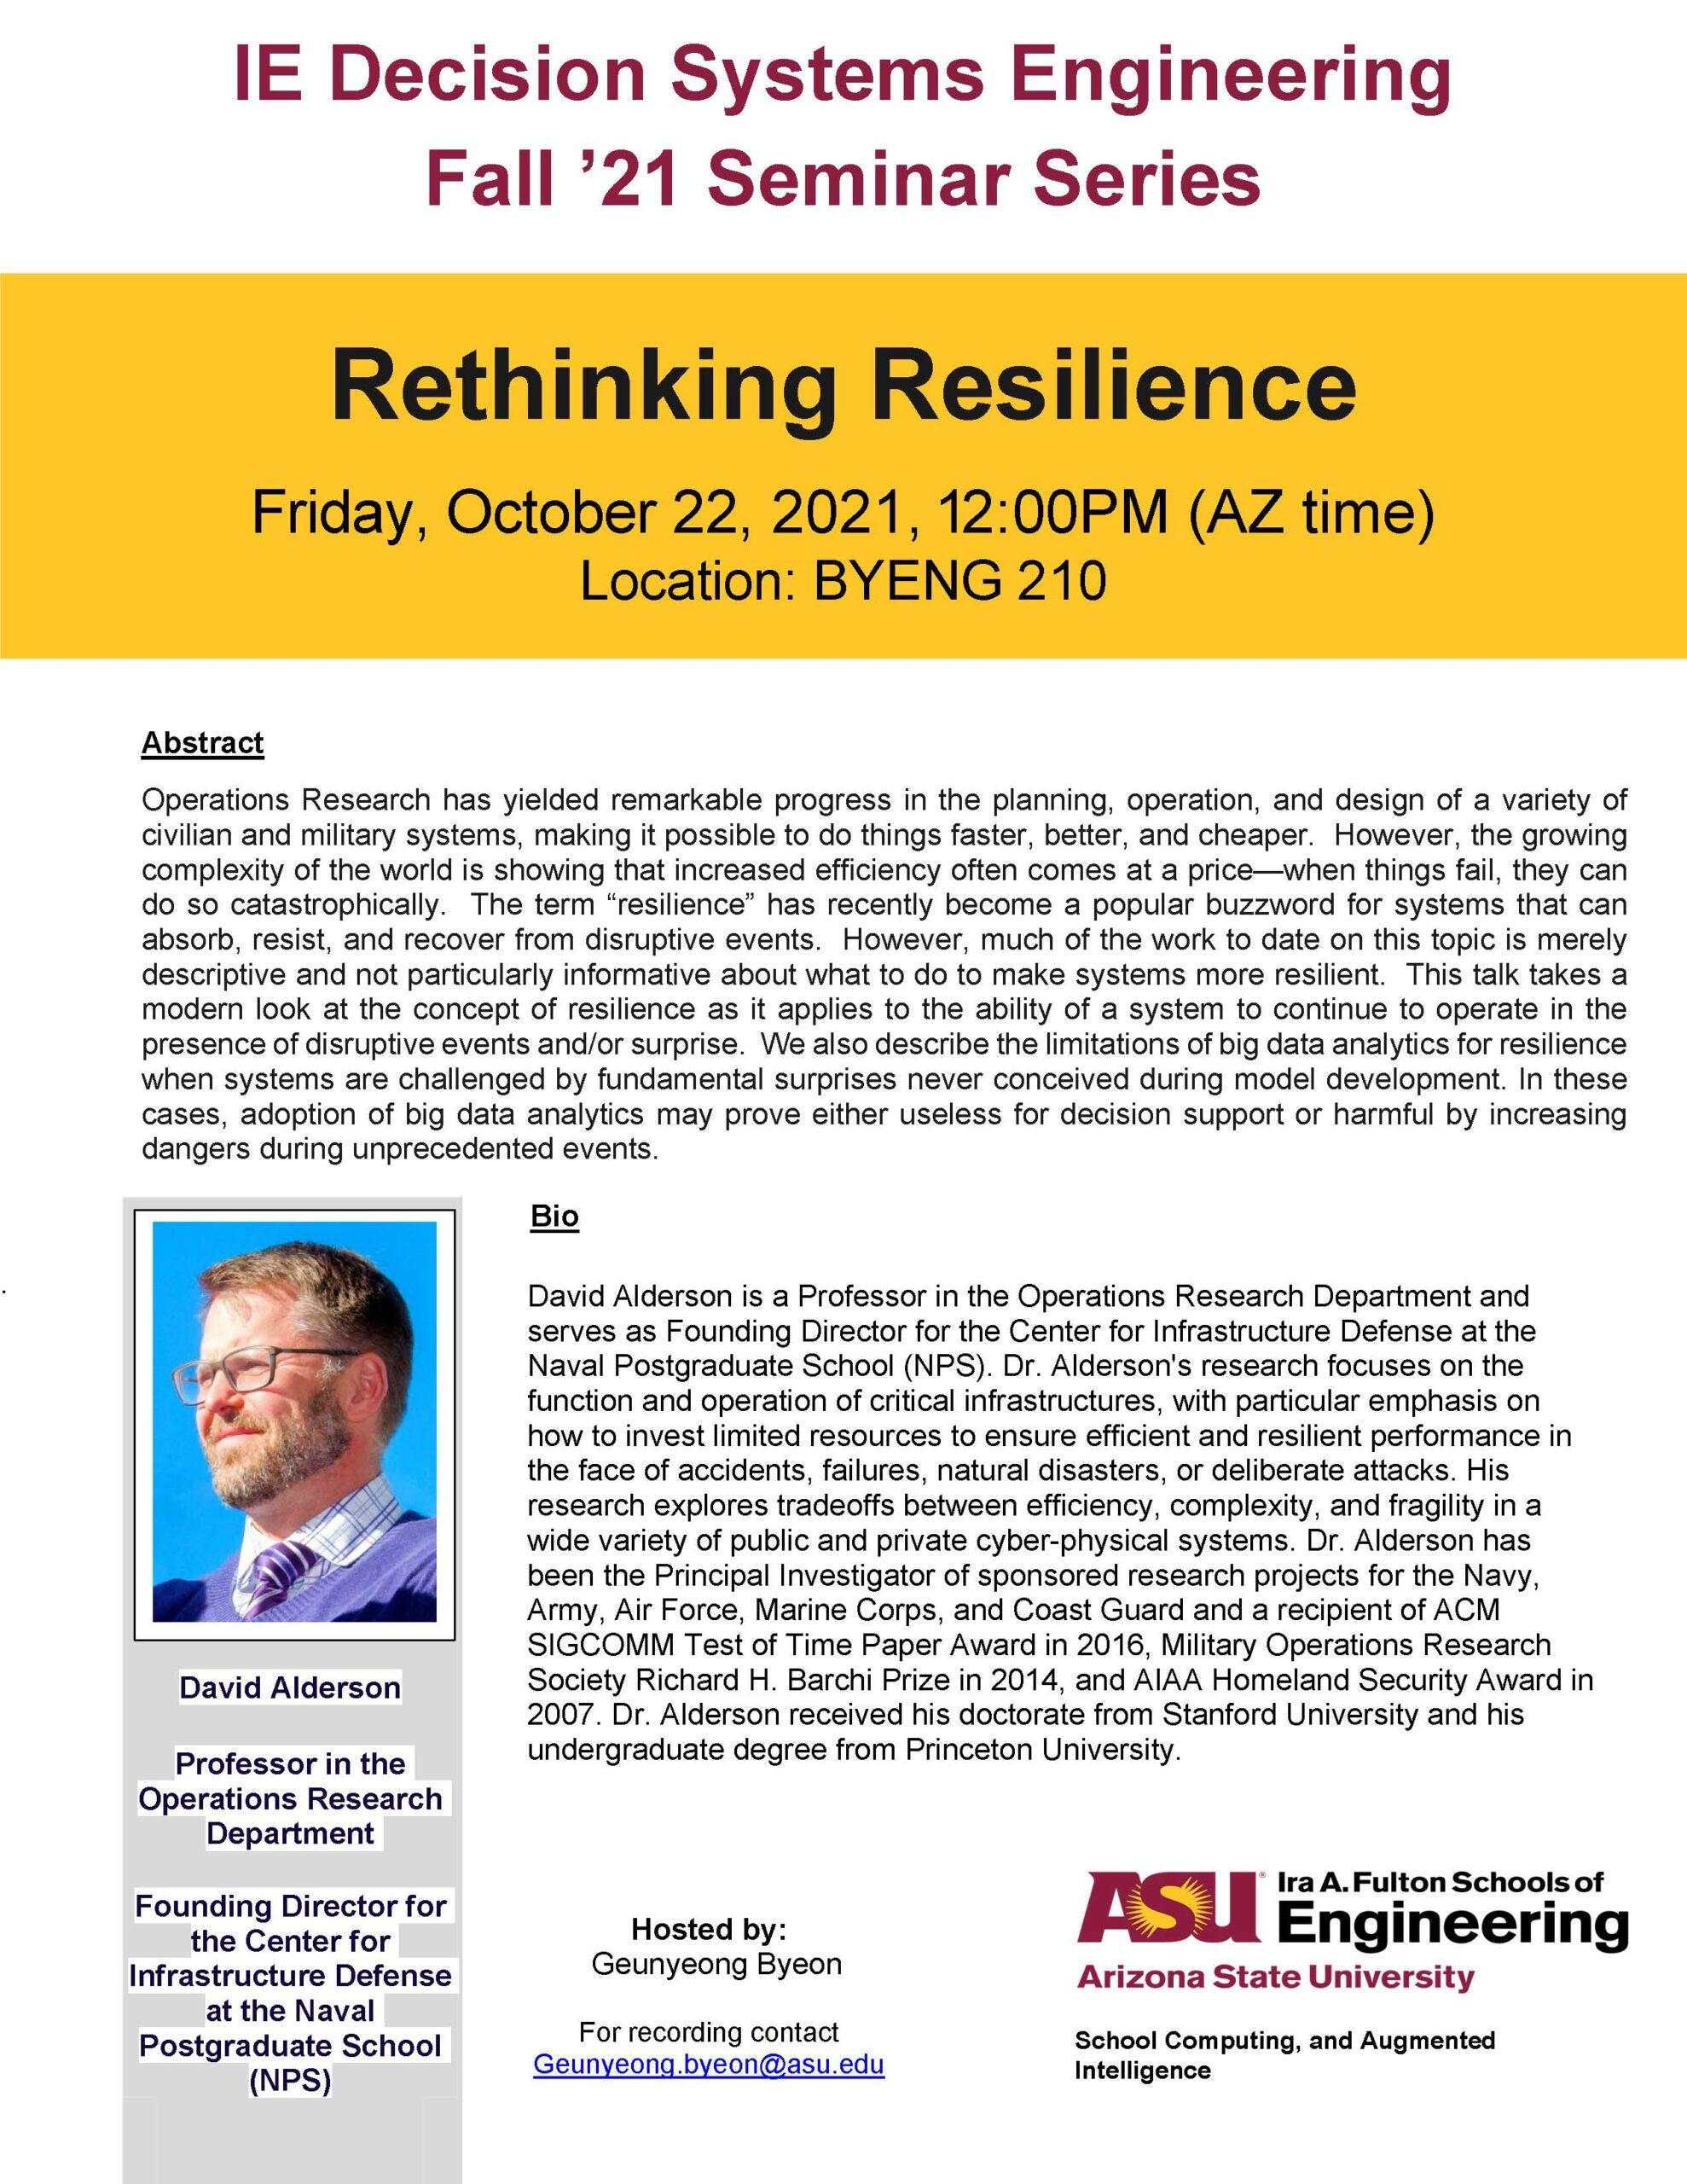 Rethinking Resilience, October 22, 2021